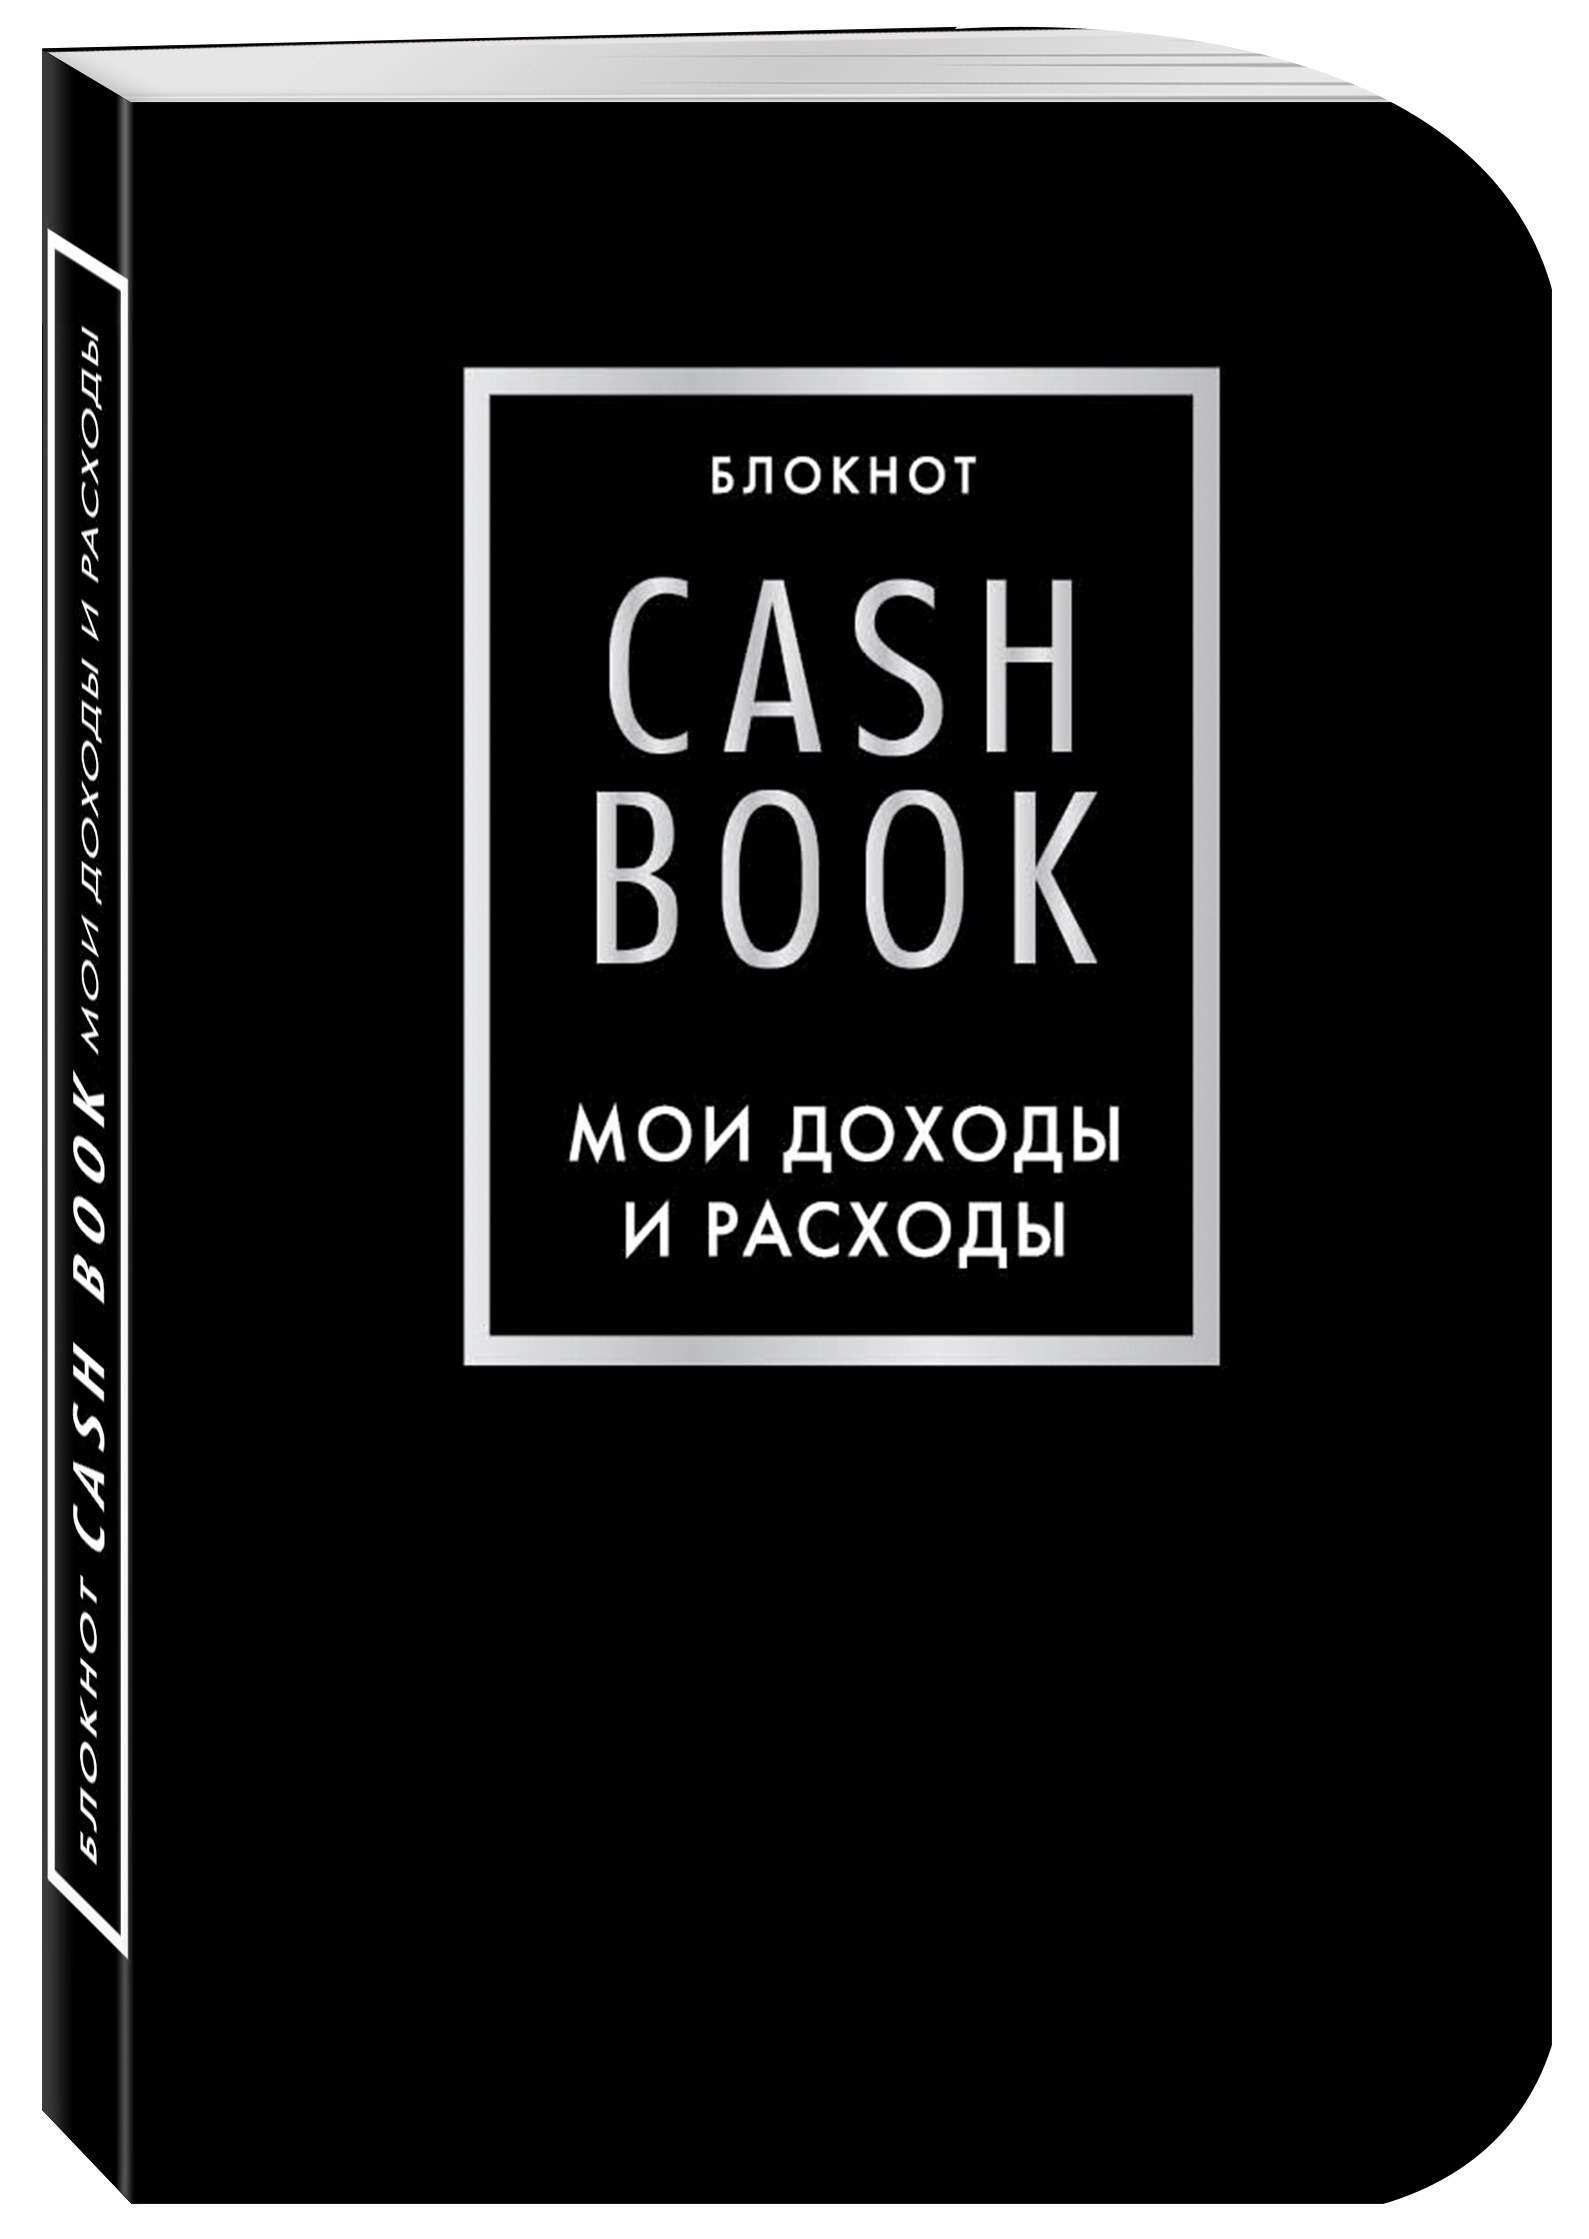 CashBook. Мои доходы и расходы. 6-е издание (черный) cashbook мои доходы и расходы 4 е изд 3 е оф